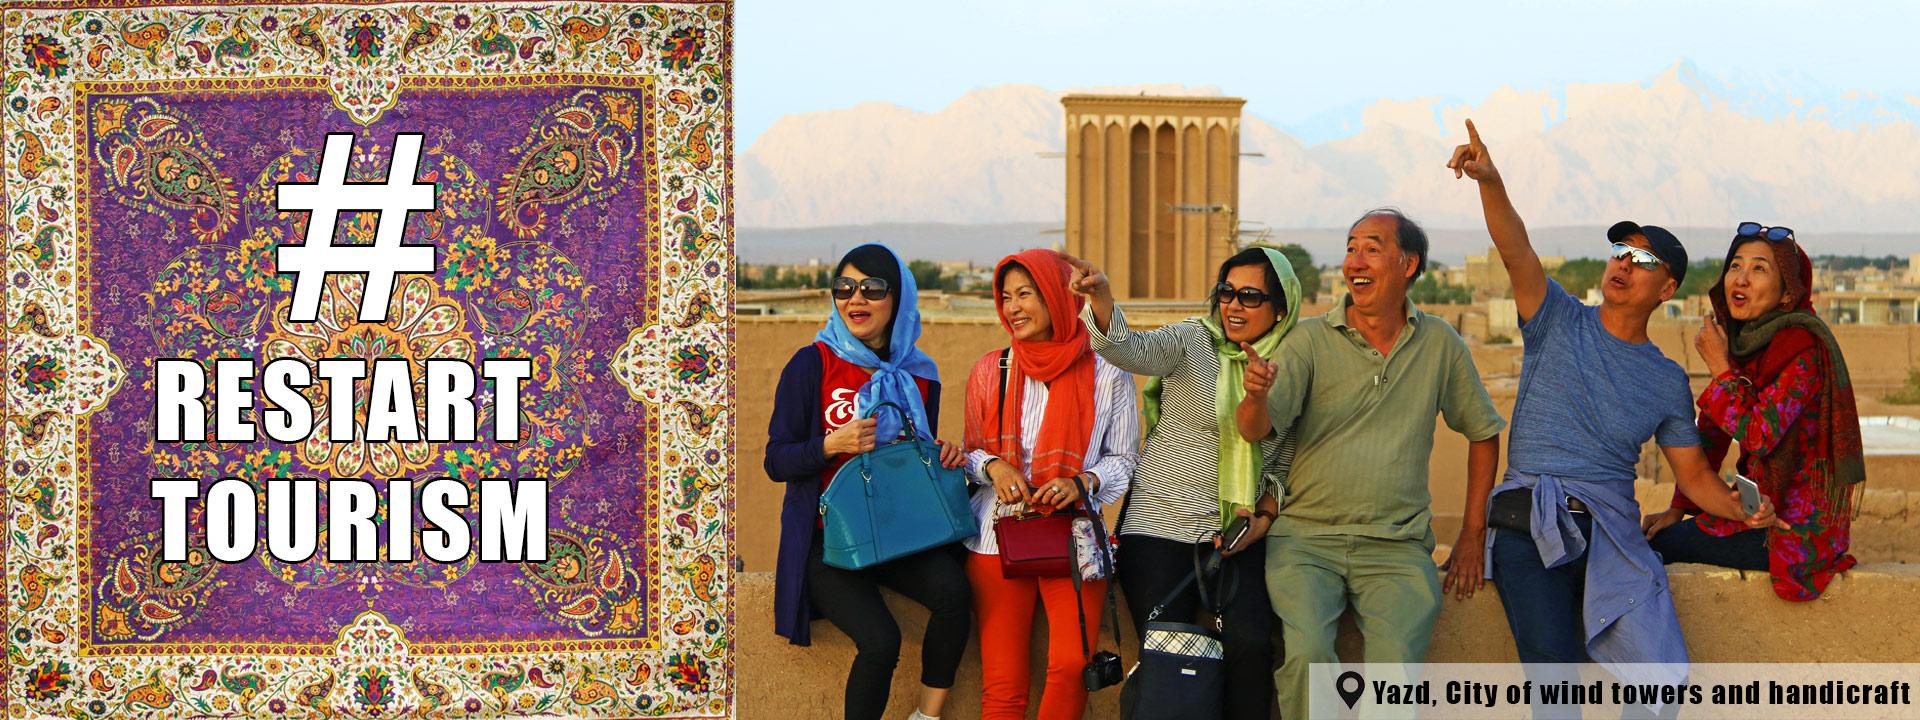 Travelers visiting Yazd, Iran